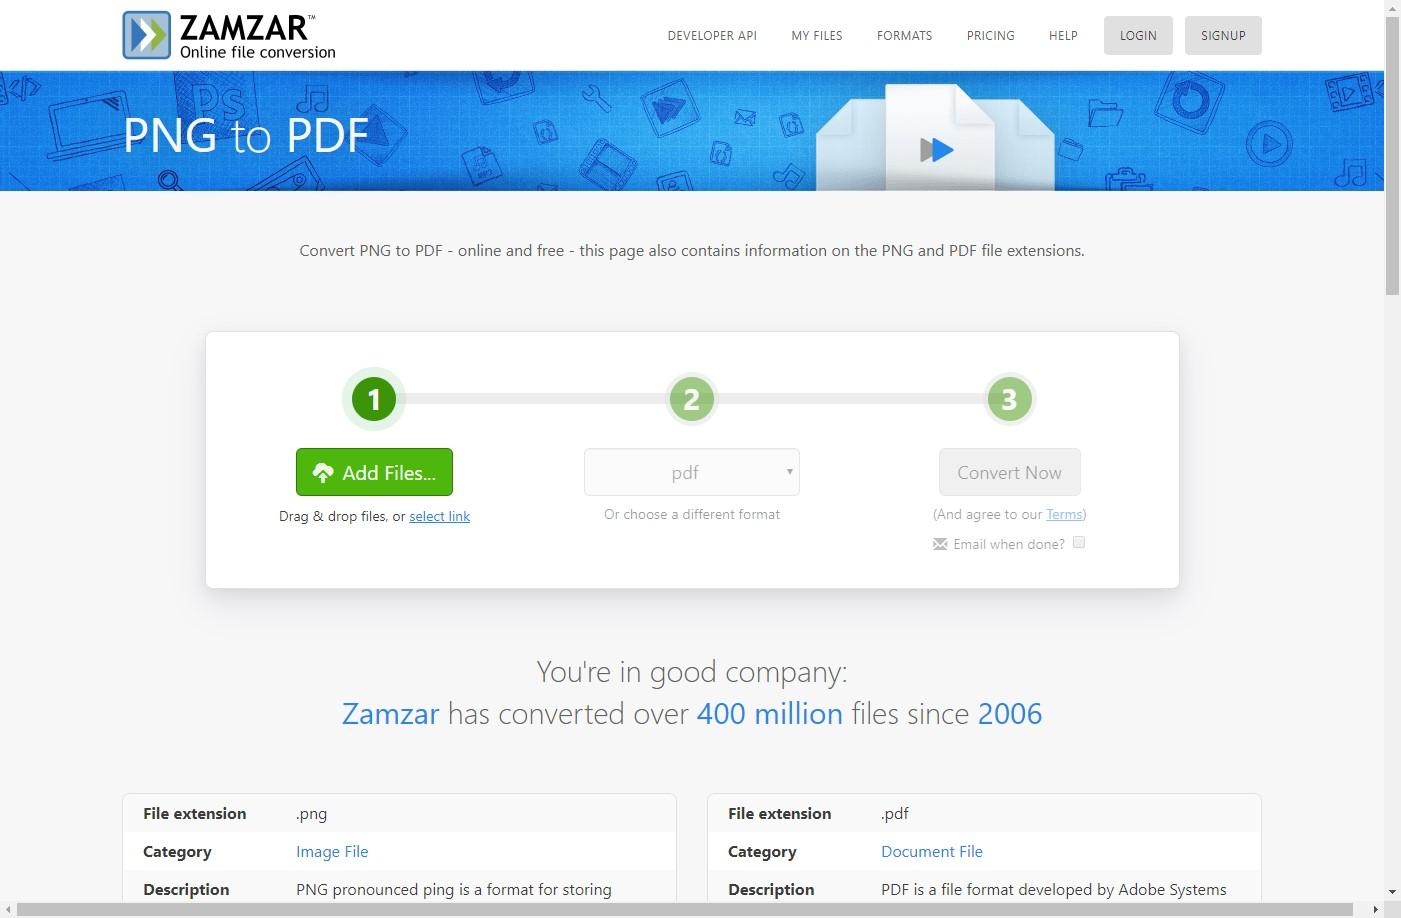 zamzar png to pdf converter online